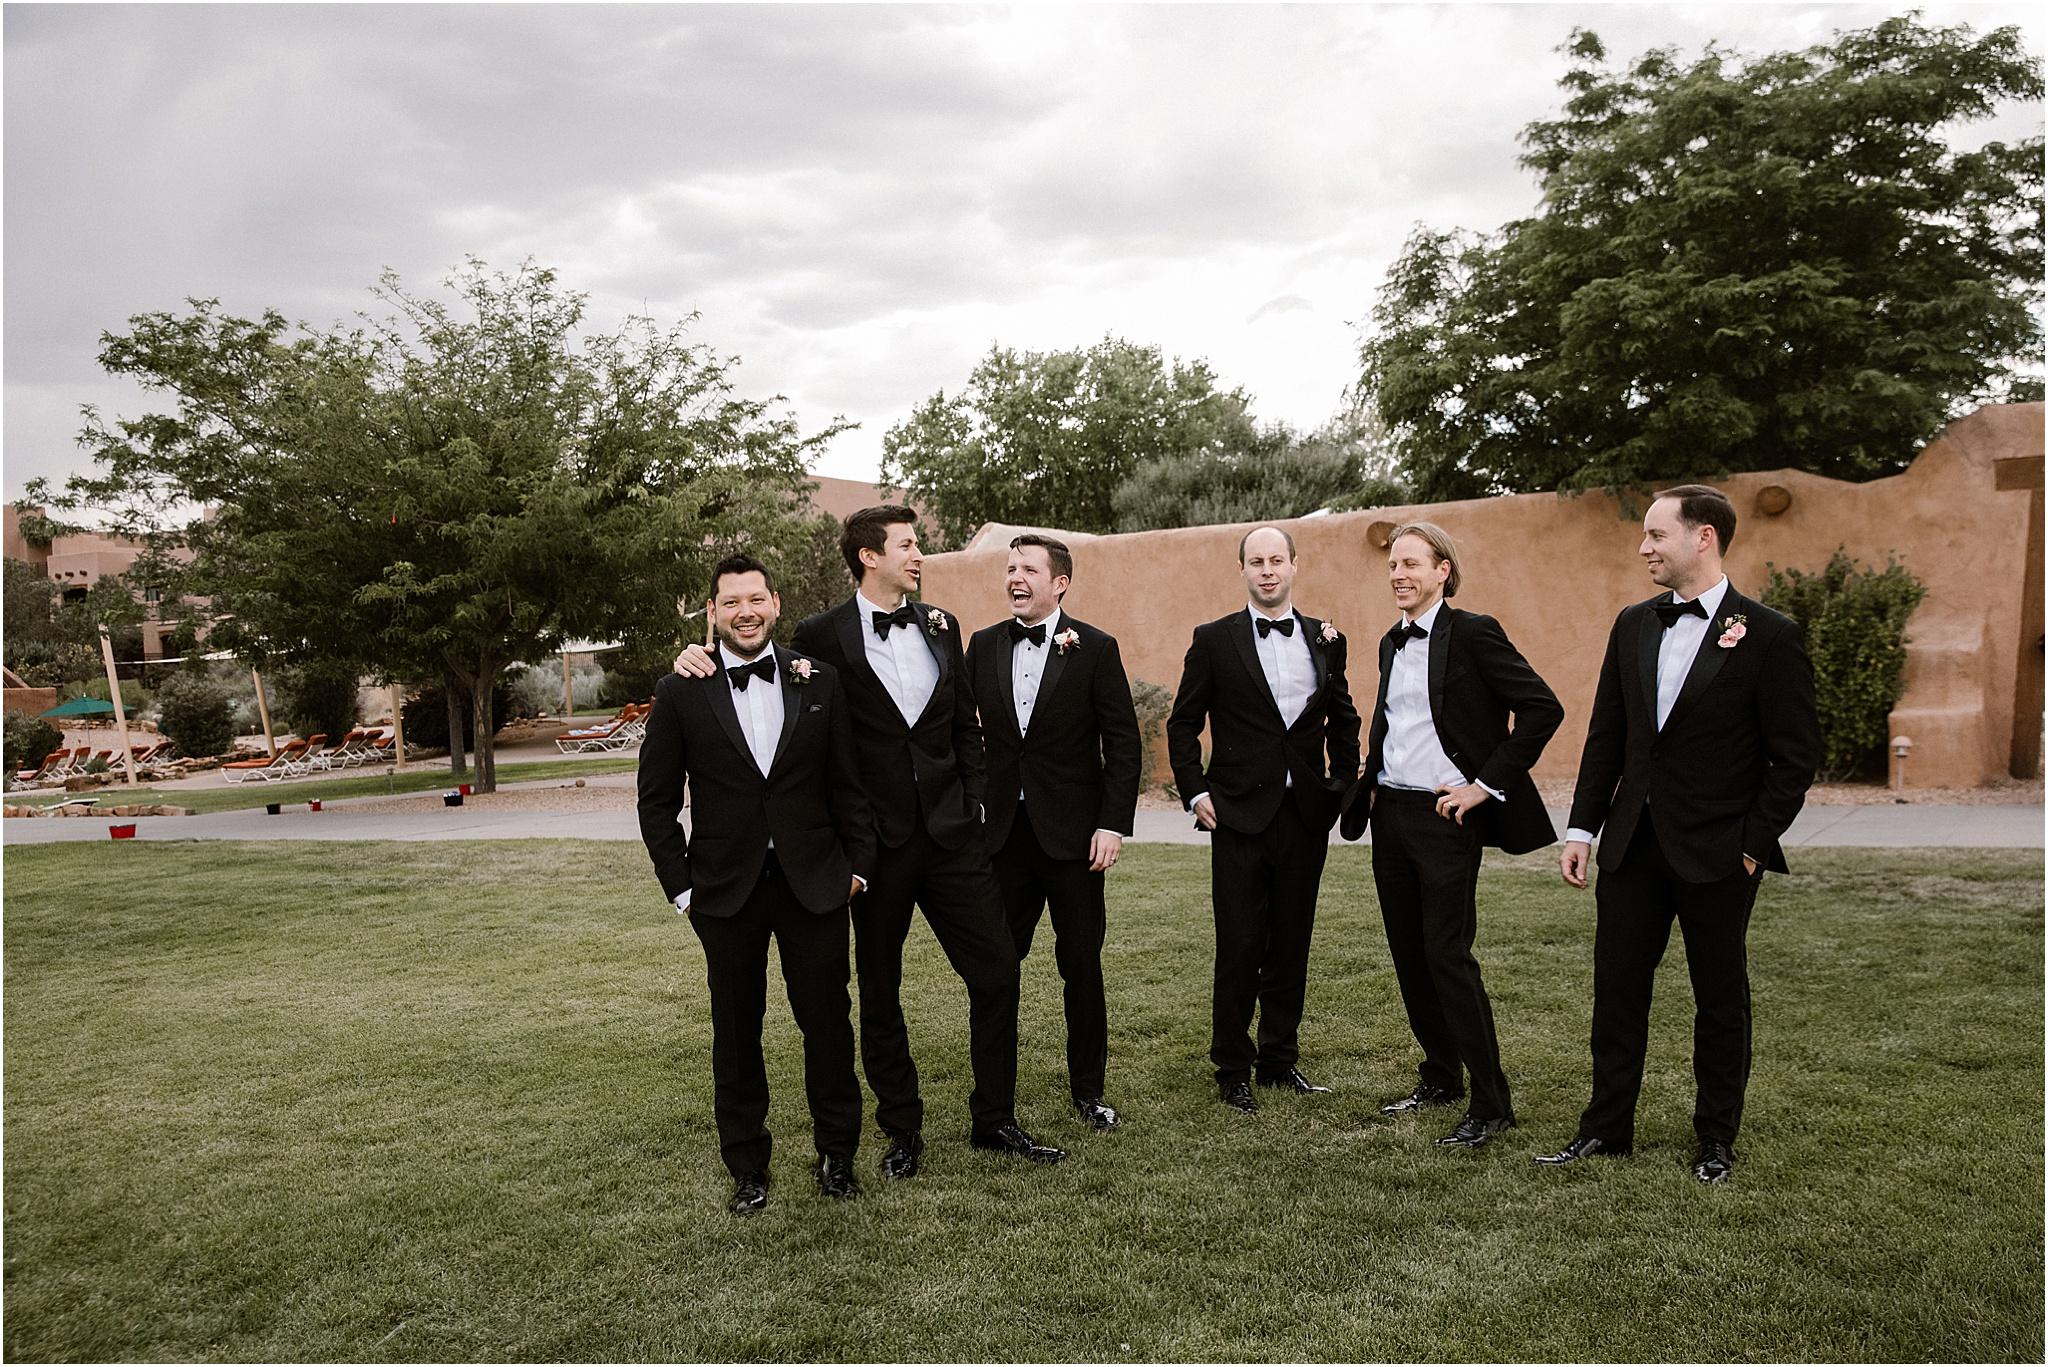 JENNA_JEROME_BLUE ROSE PHOTOGRAPHY_ABQ WEDDING_42